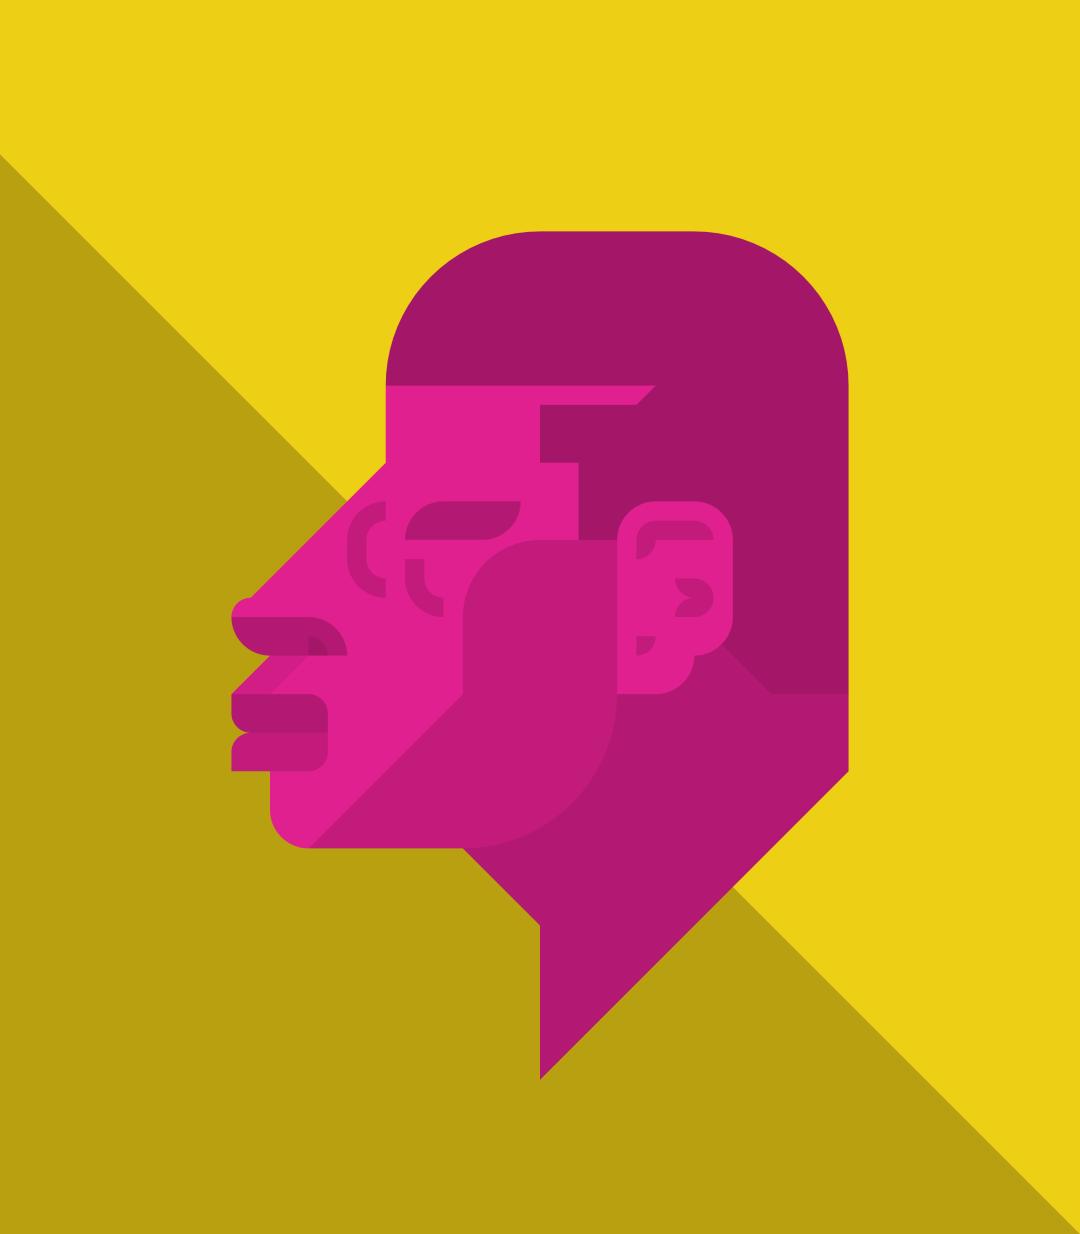 Profile of man #2